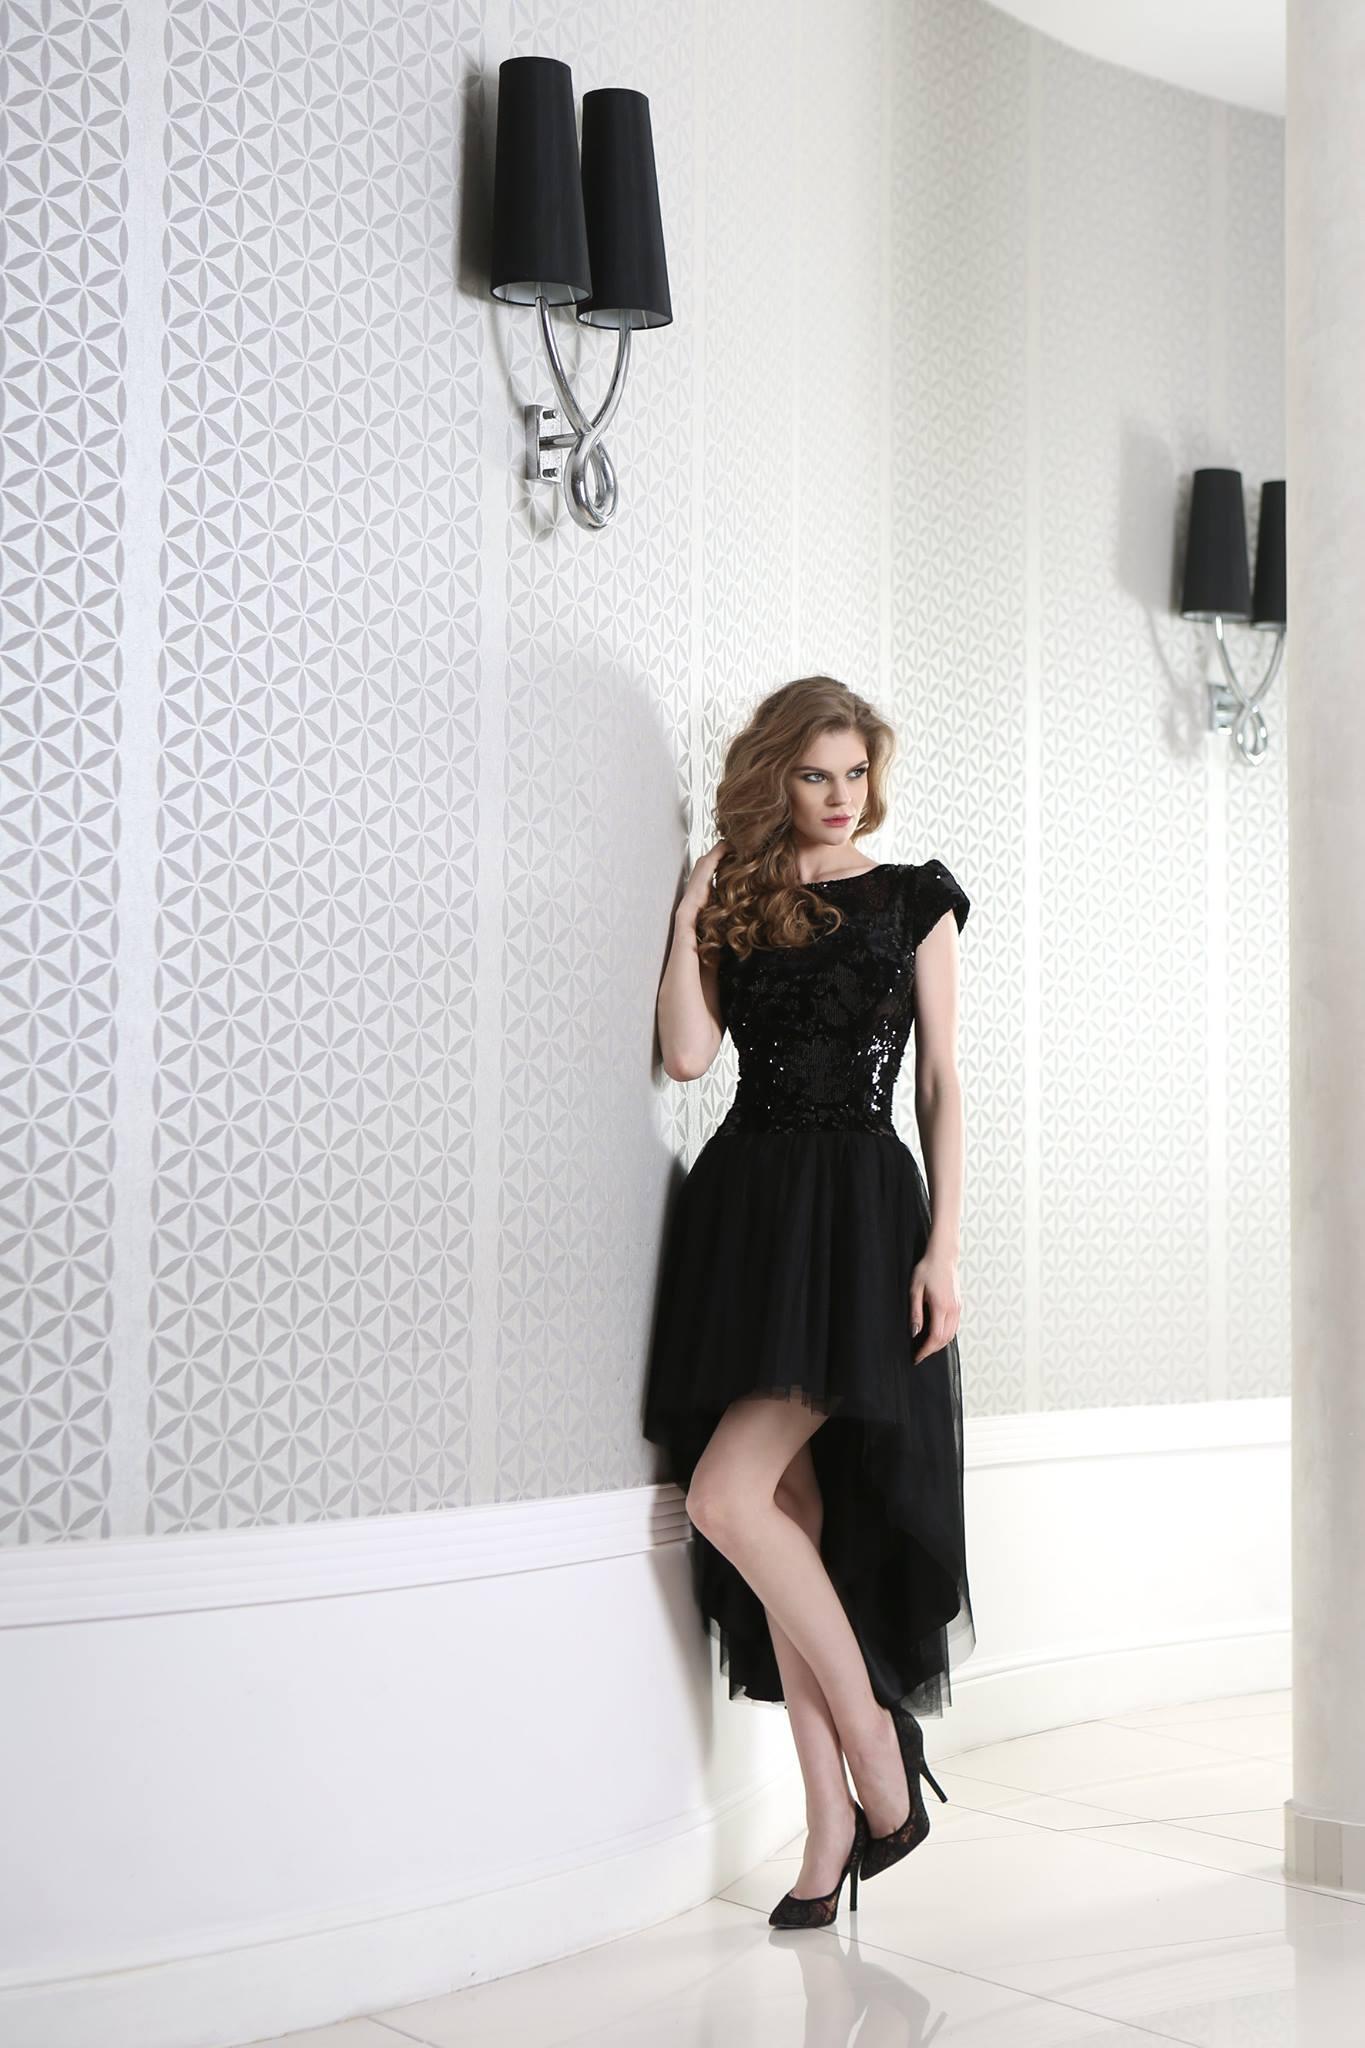 schwarzes cocktailkleid vorne kurz hinten lang mit. Black Bedroom Furniture Sets. Home Design Ideas